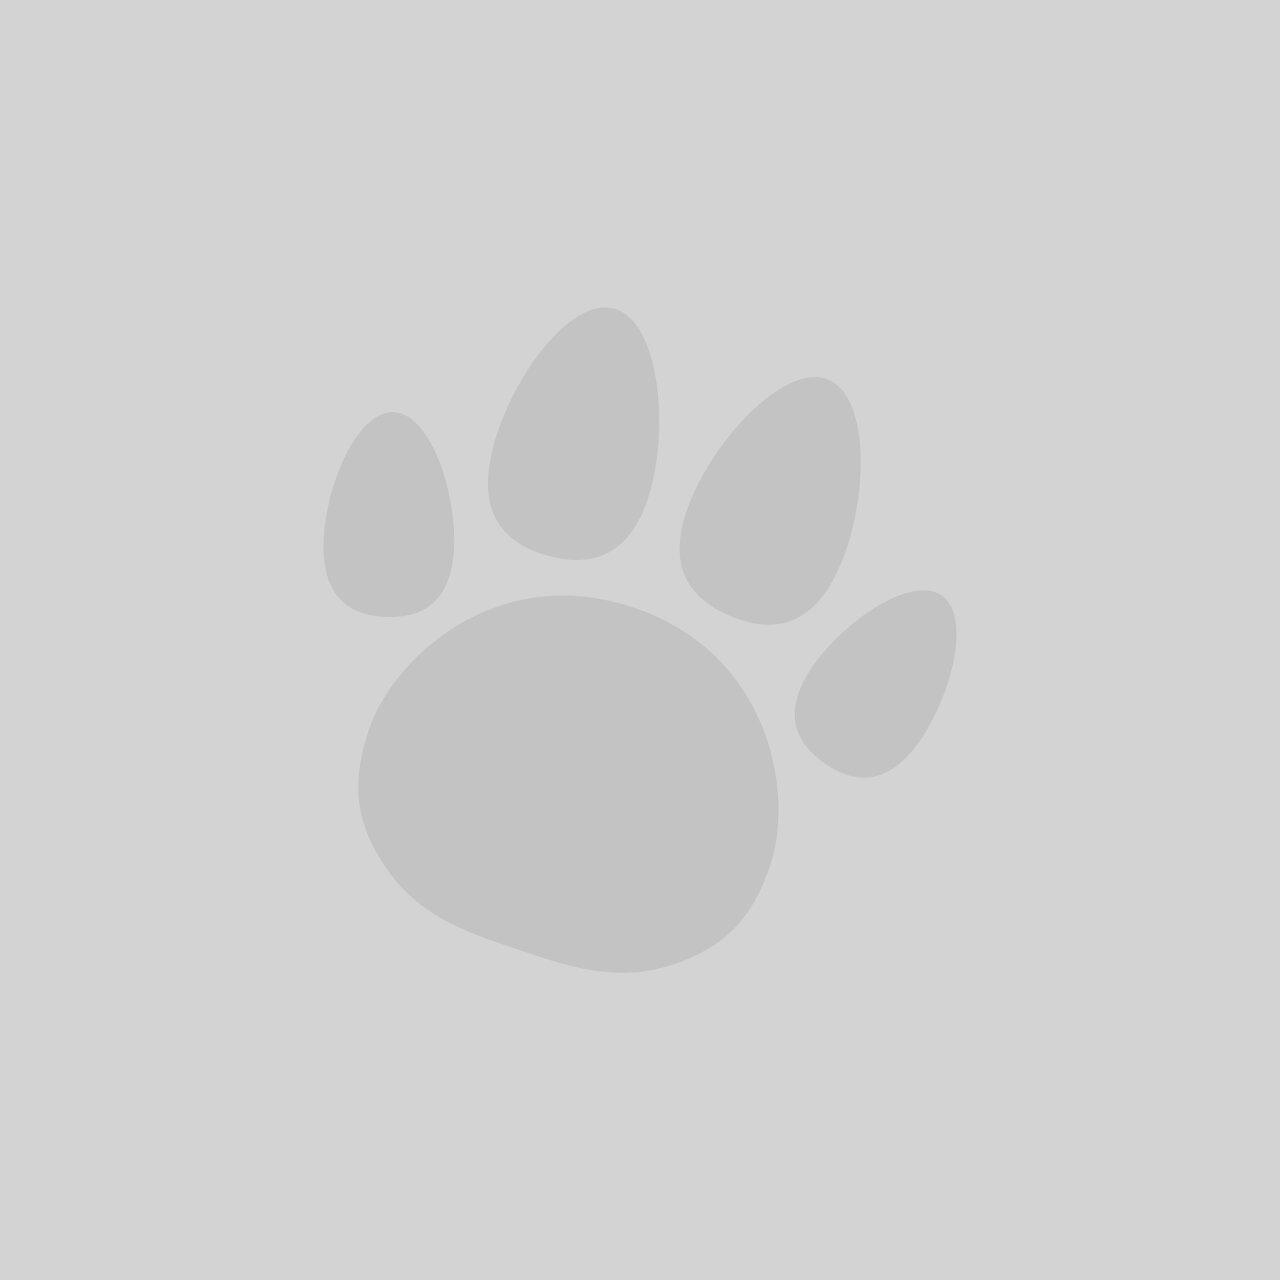 Pedigree Dentastix Twice Weekly Small Dog Dental Chews 3 Pack